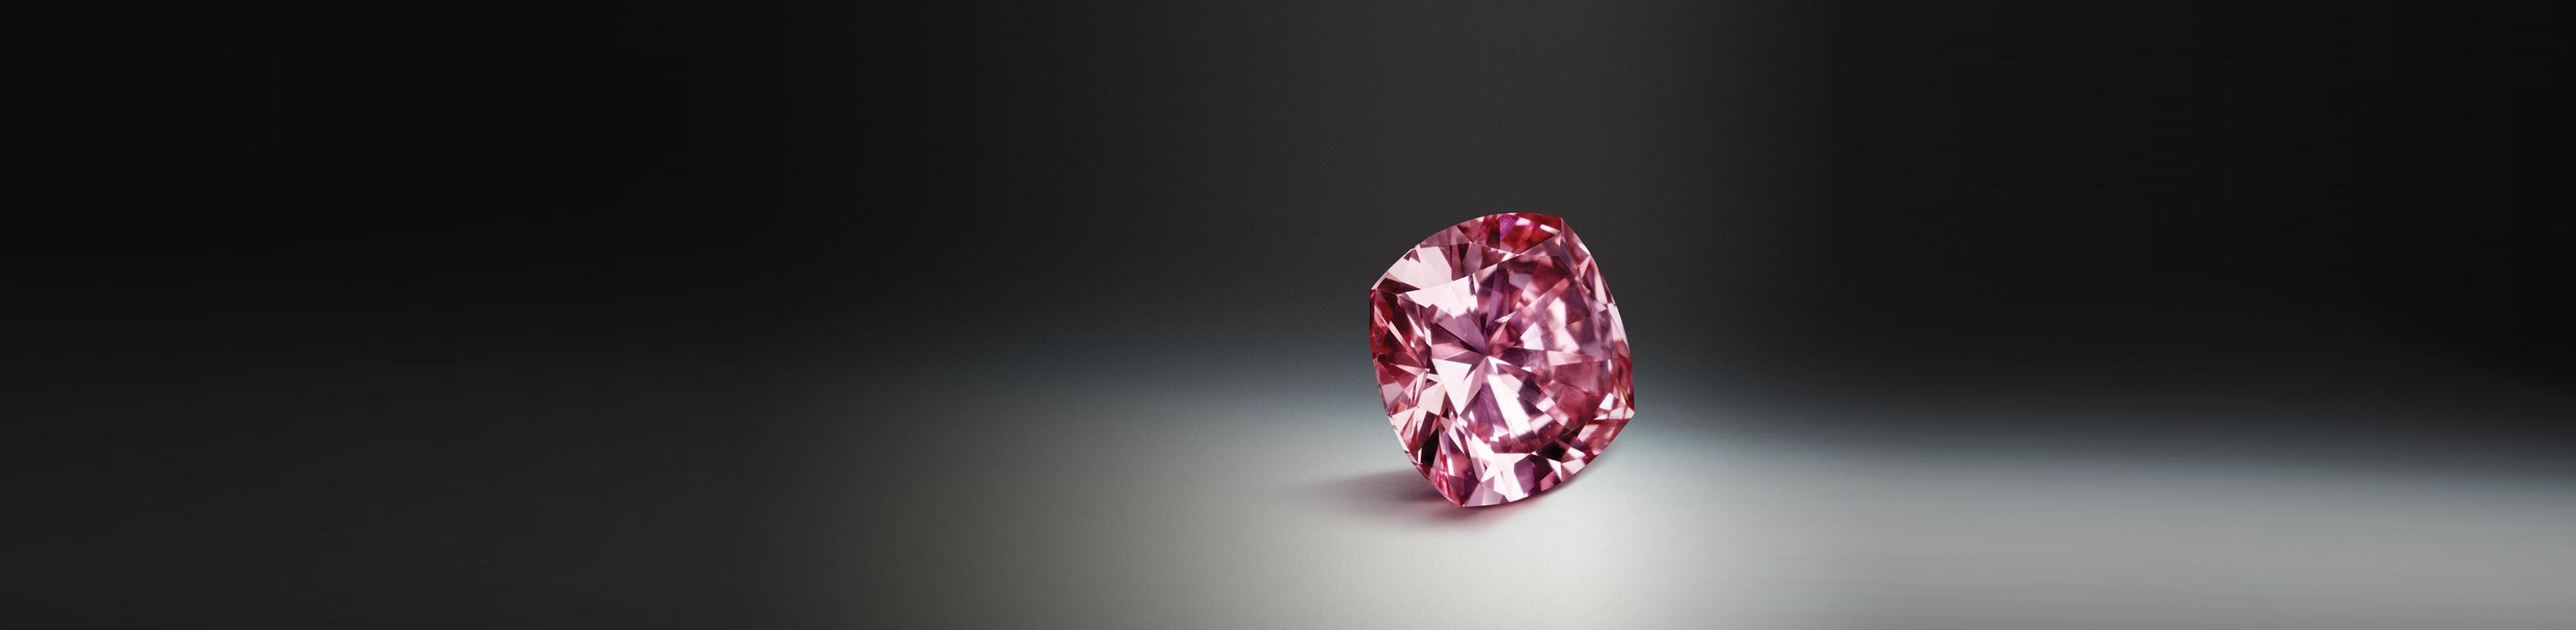 NEW ARGYLE PINK DIAMOND PENDANTS - FEBRUARY 2021 NEWS article hero image